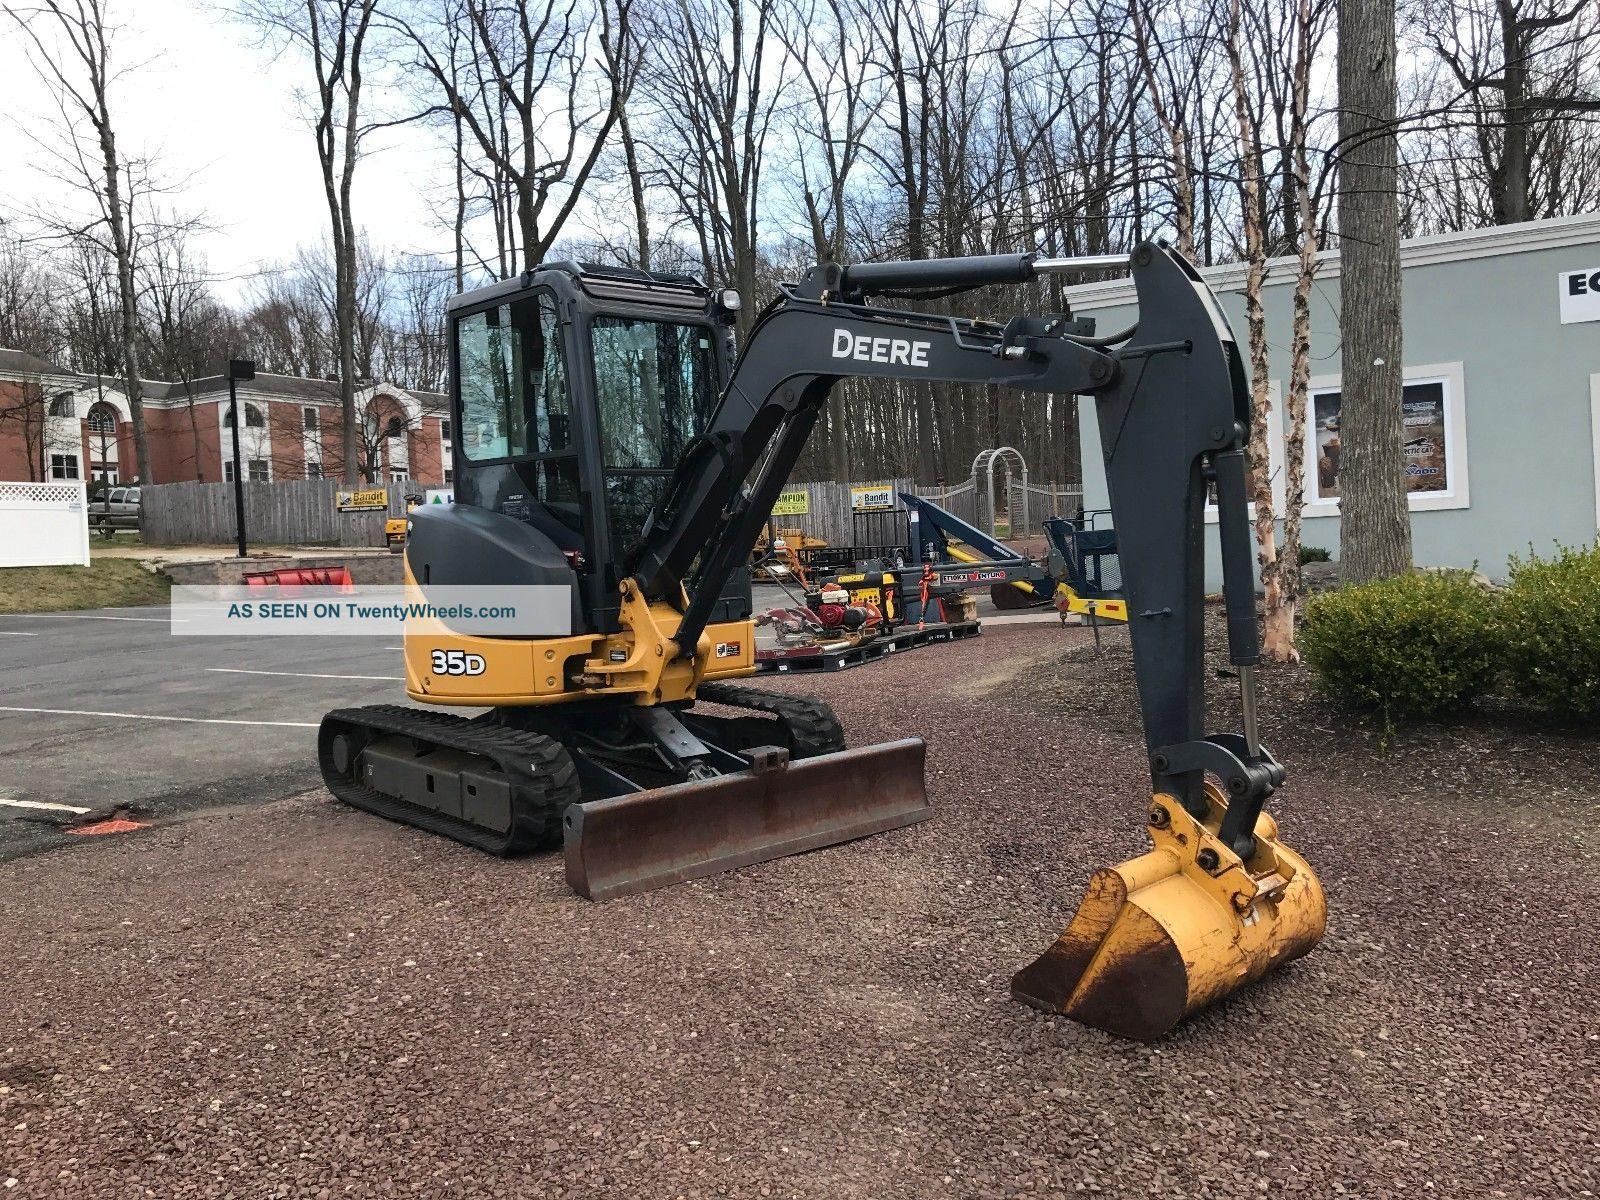 Johndeere 35d Rubber Tracks Aux Hook Ups Excavators photo